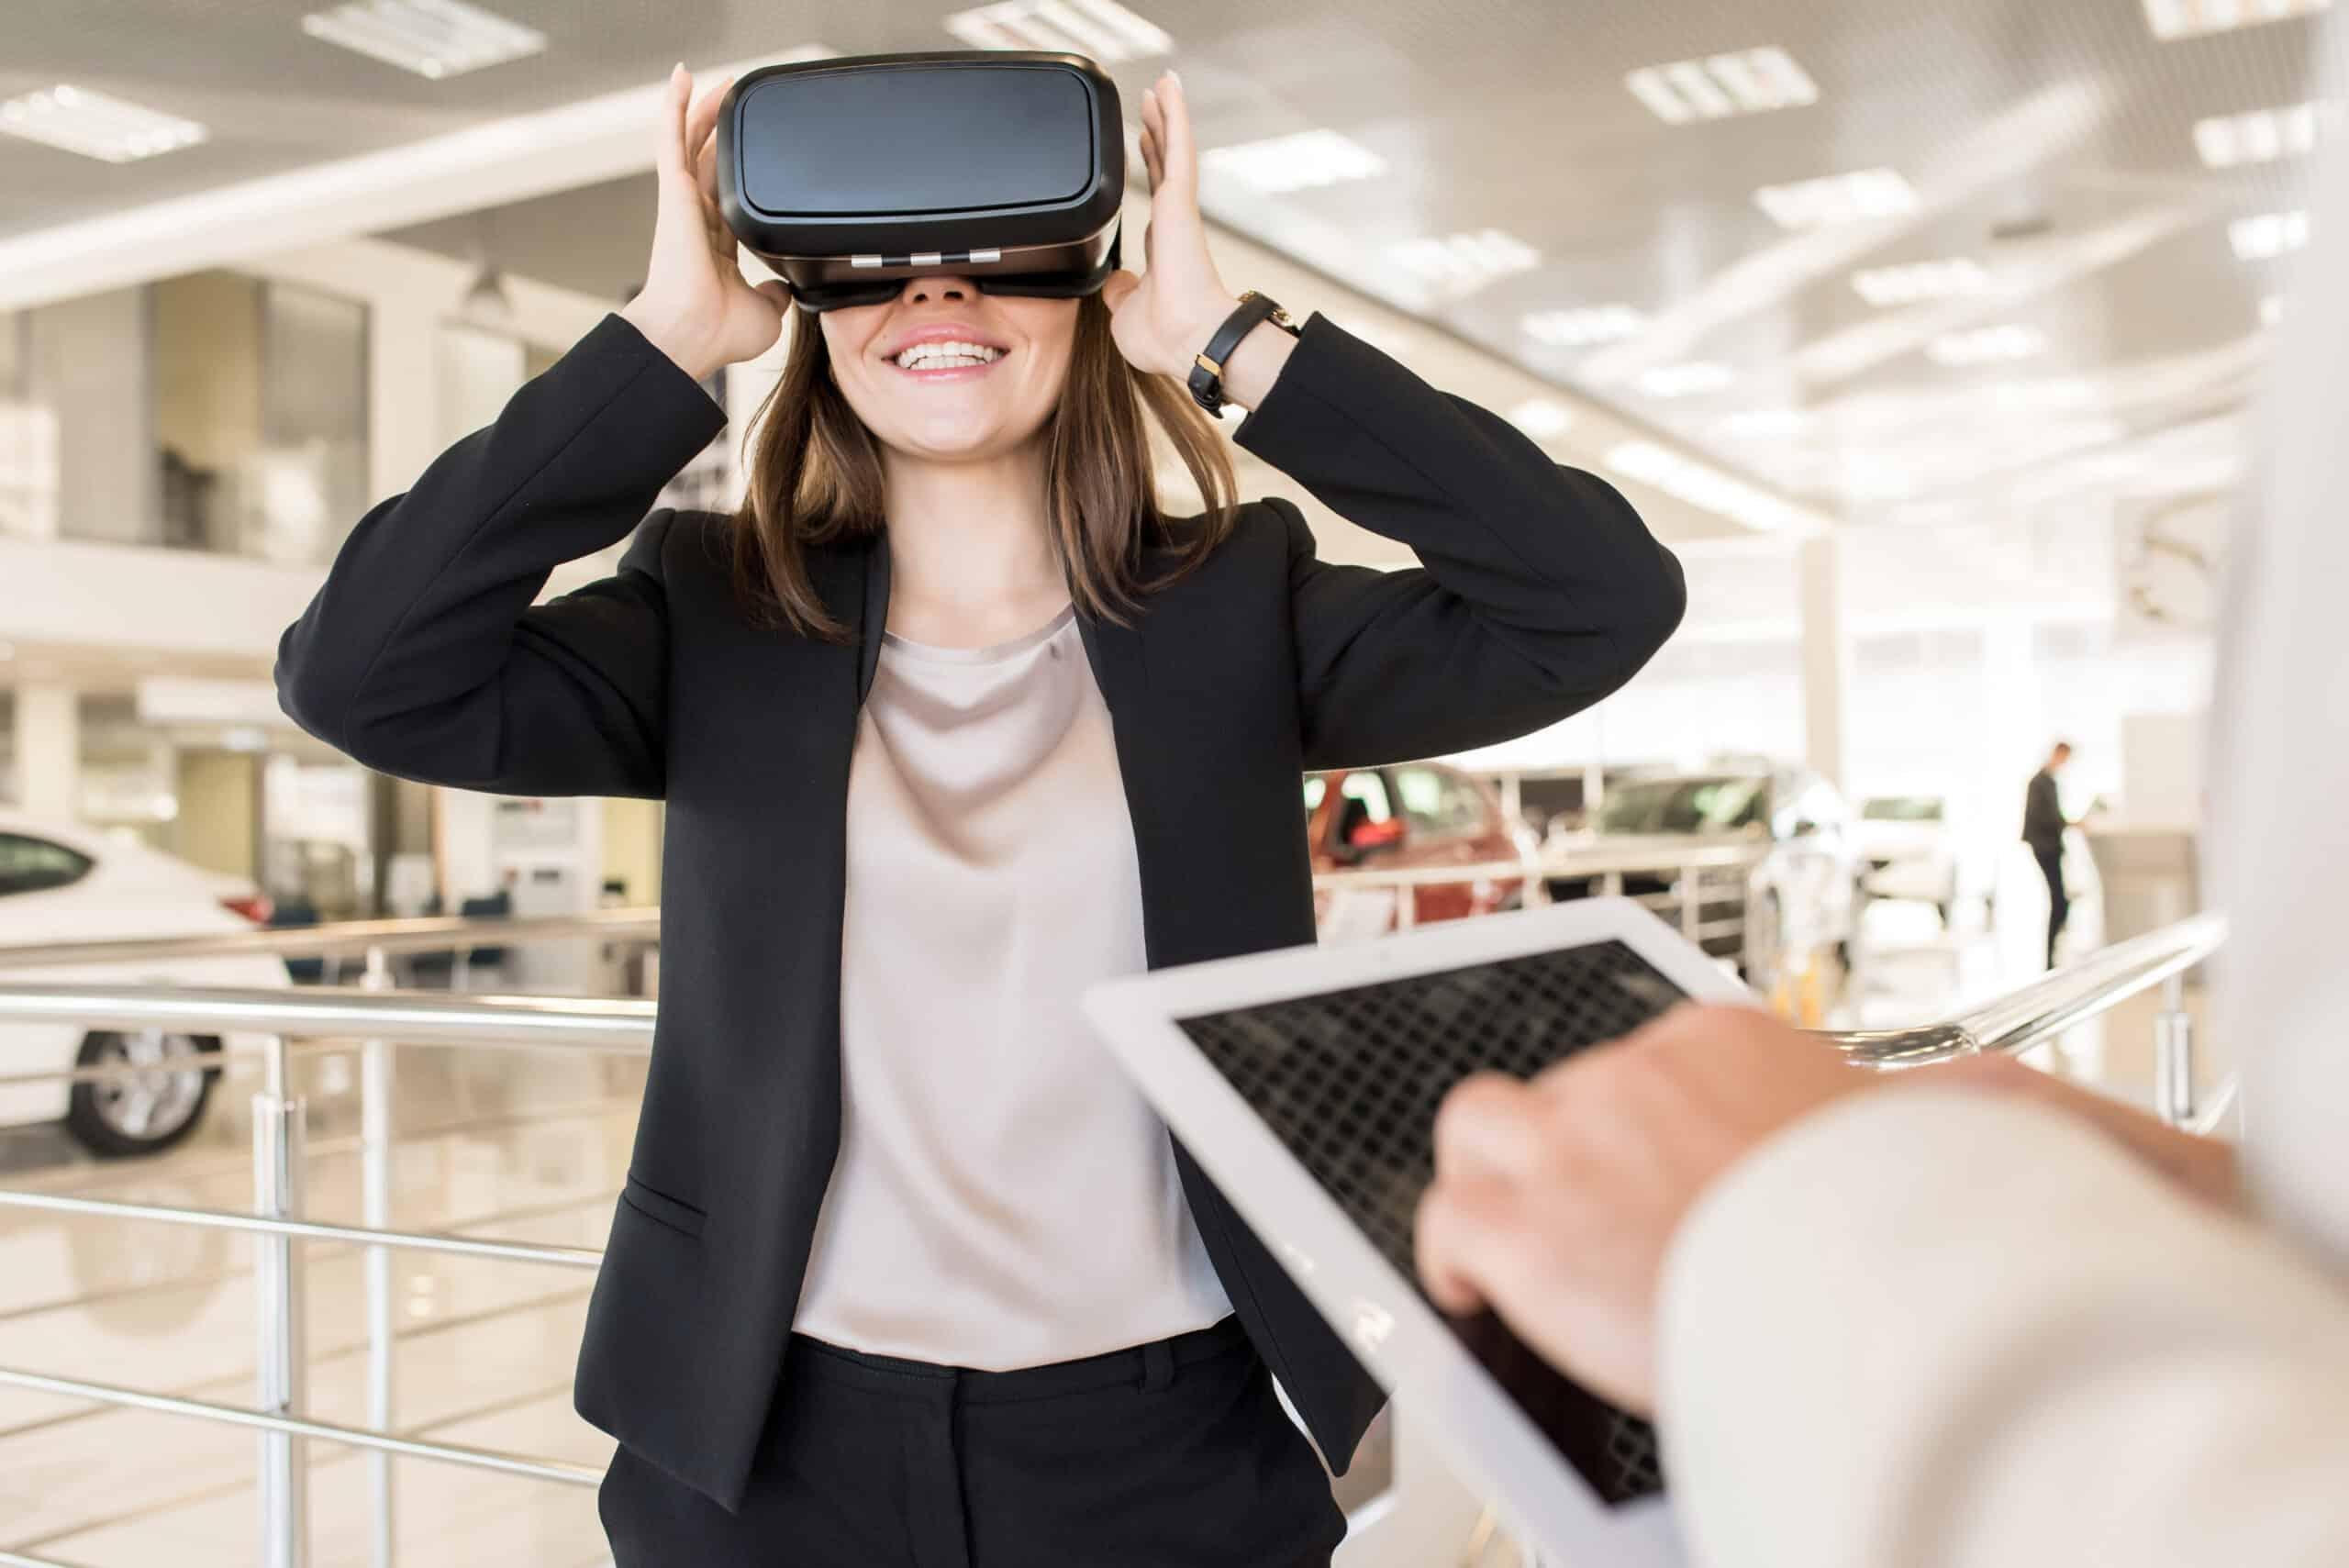 virtual reality training eye tracking